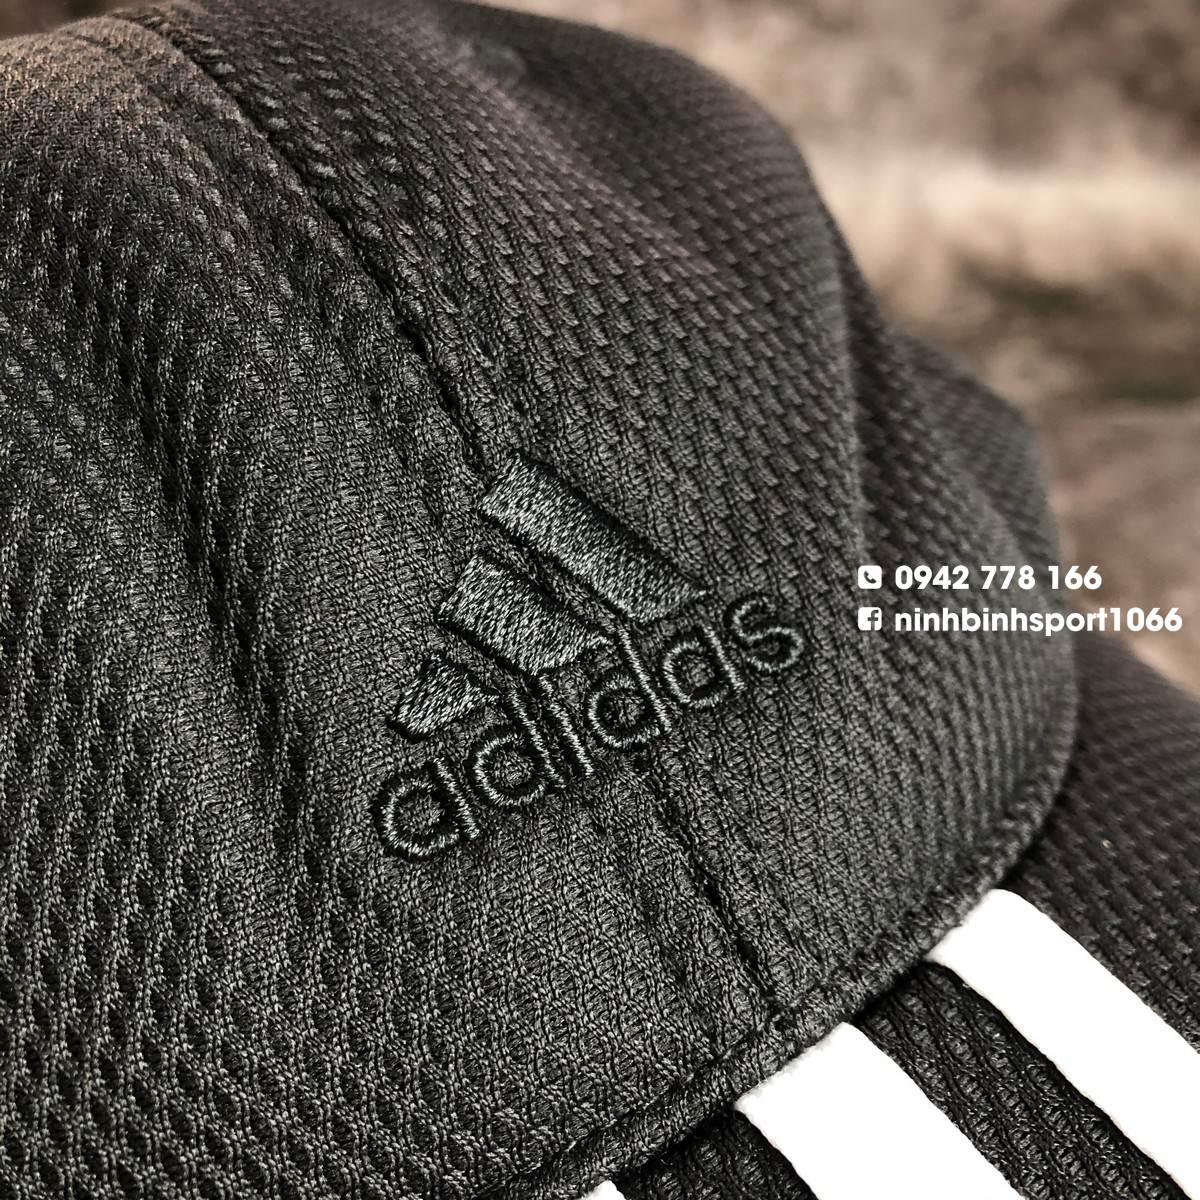 Mũ thể thao Adidas 516-01-OSFX